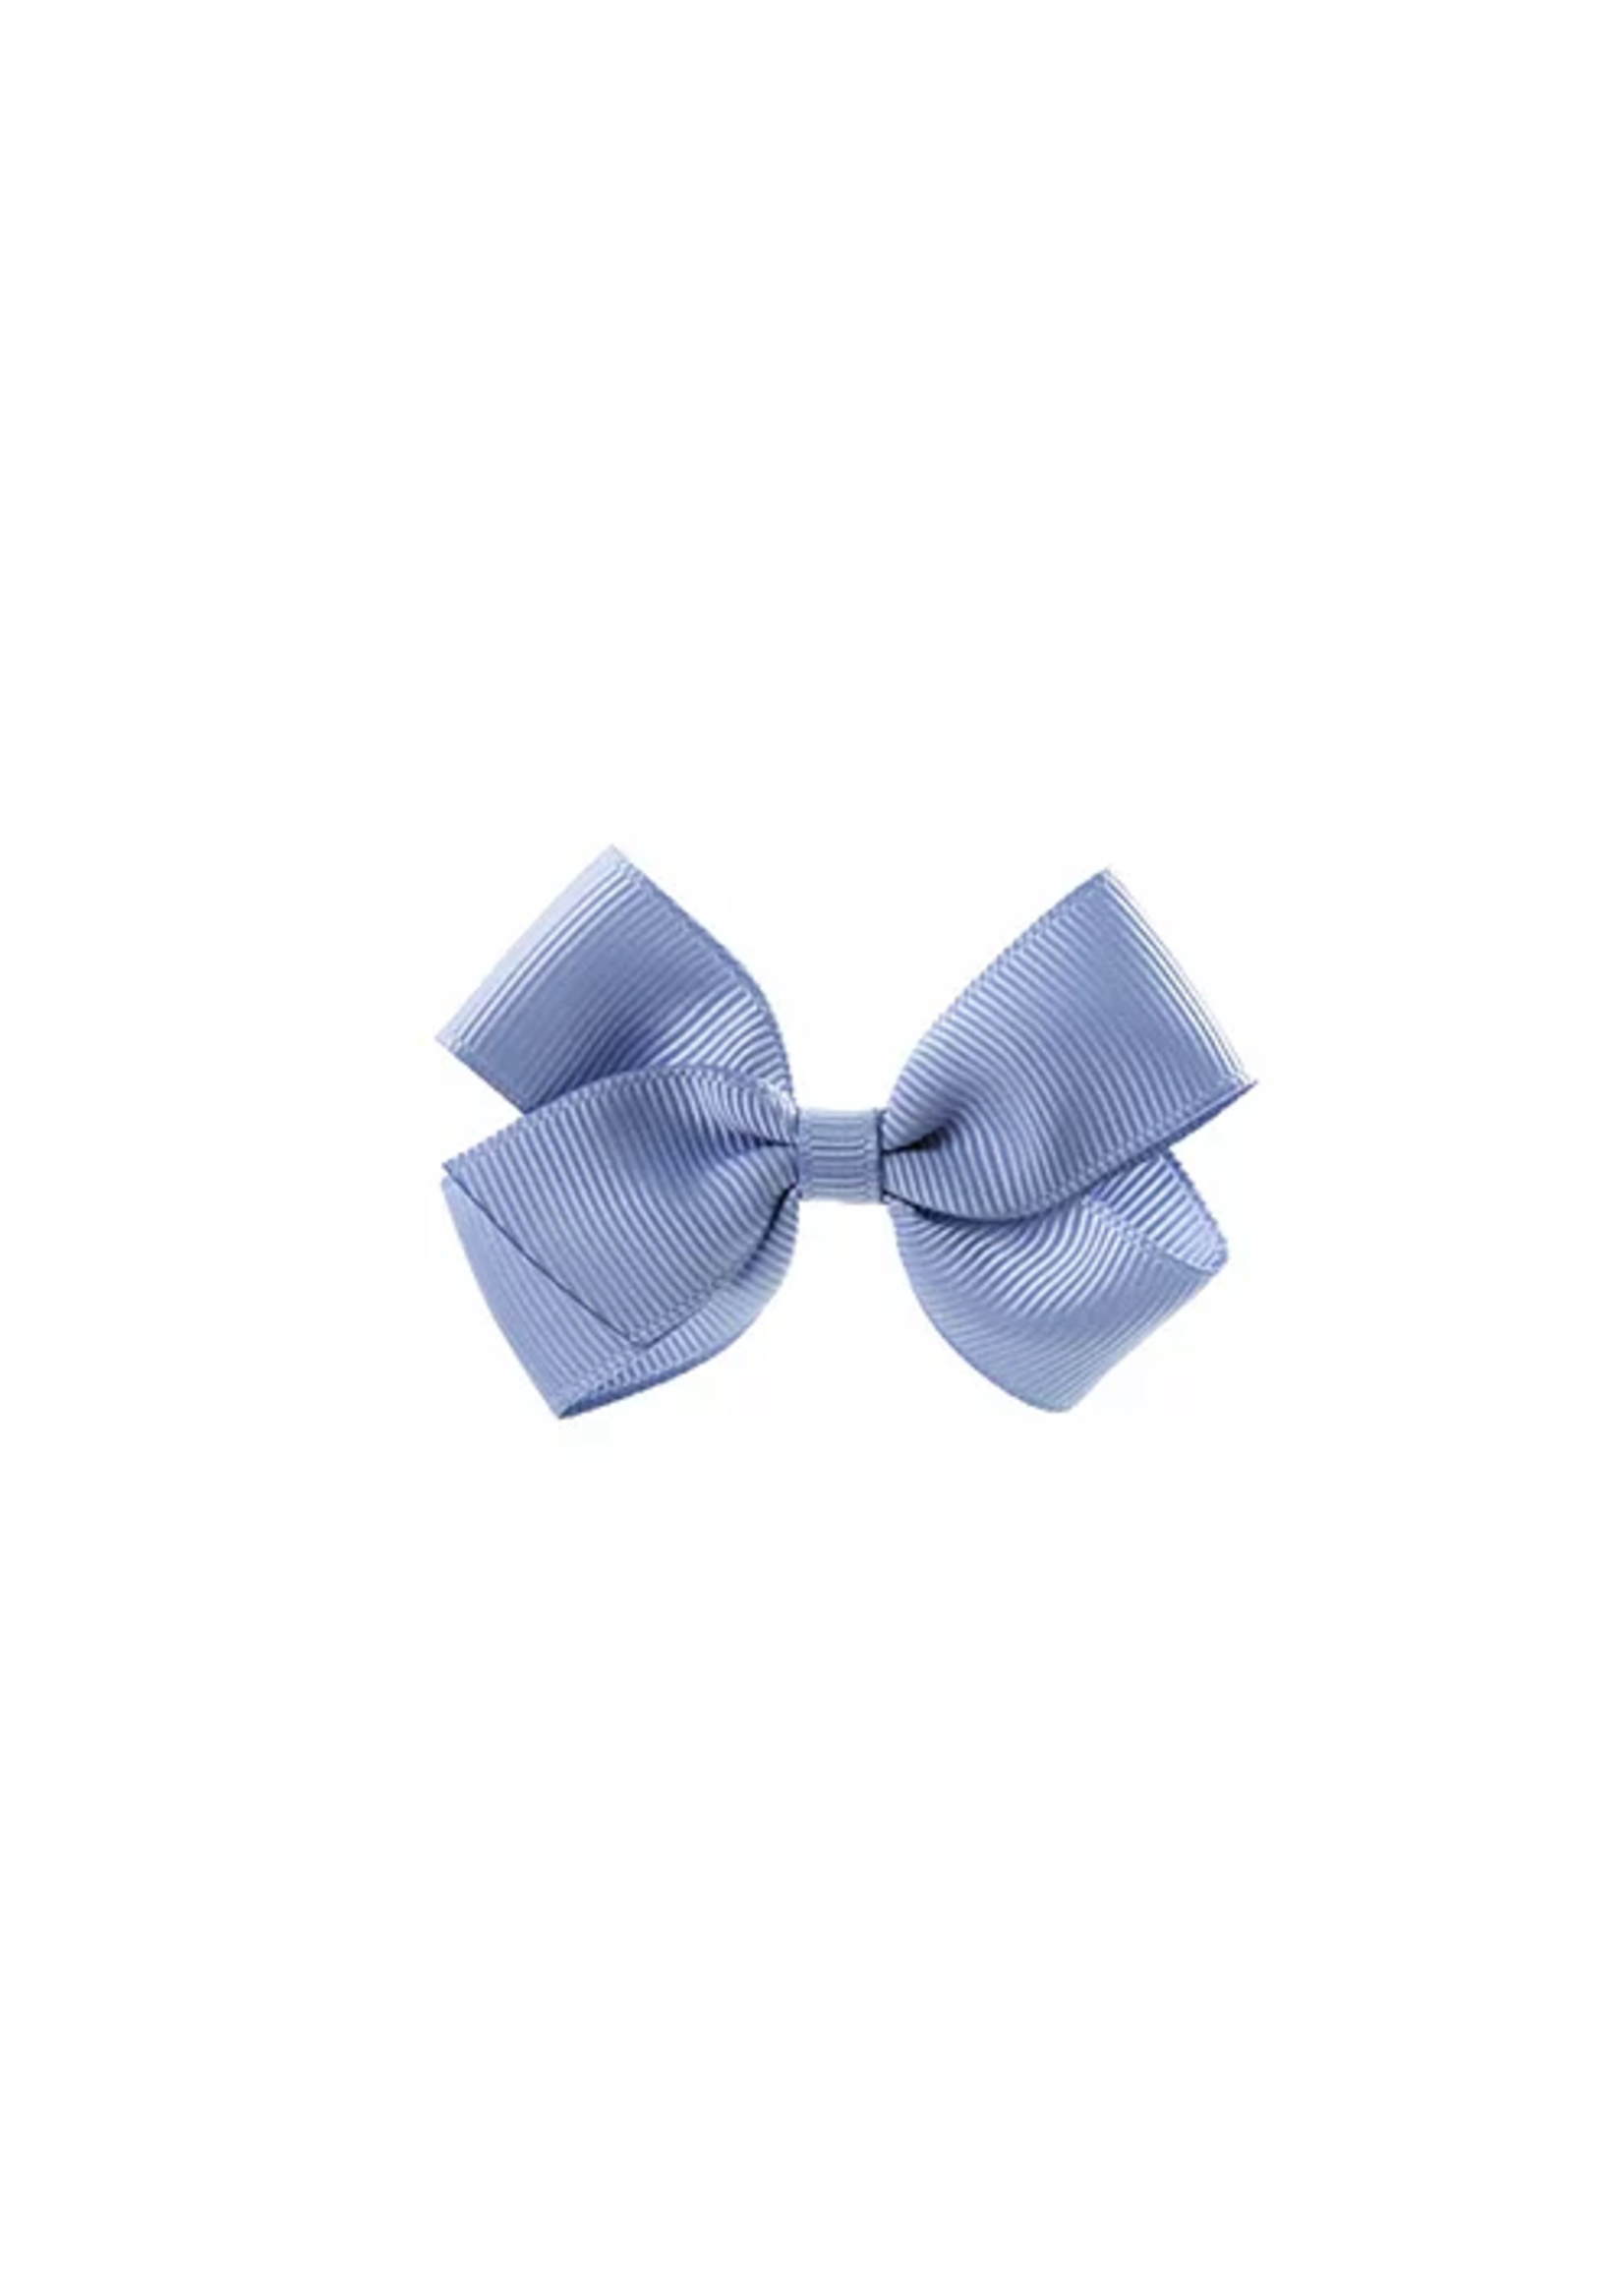 Olilia Small London Bow (French Blue)